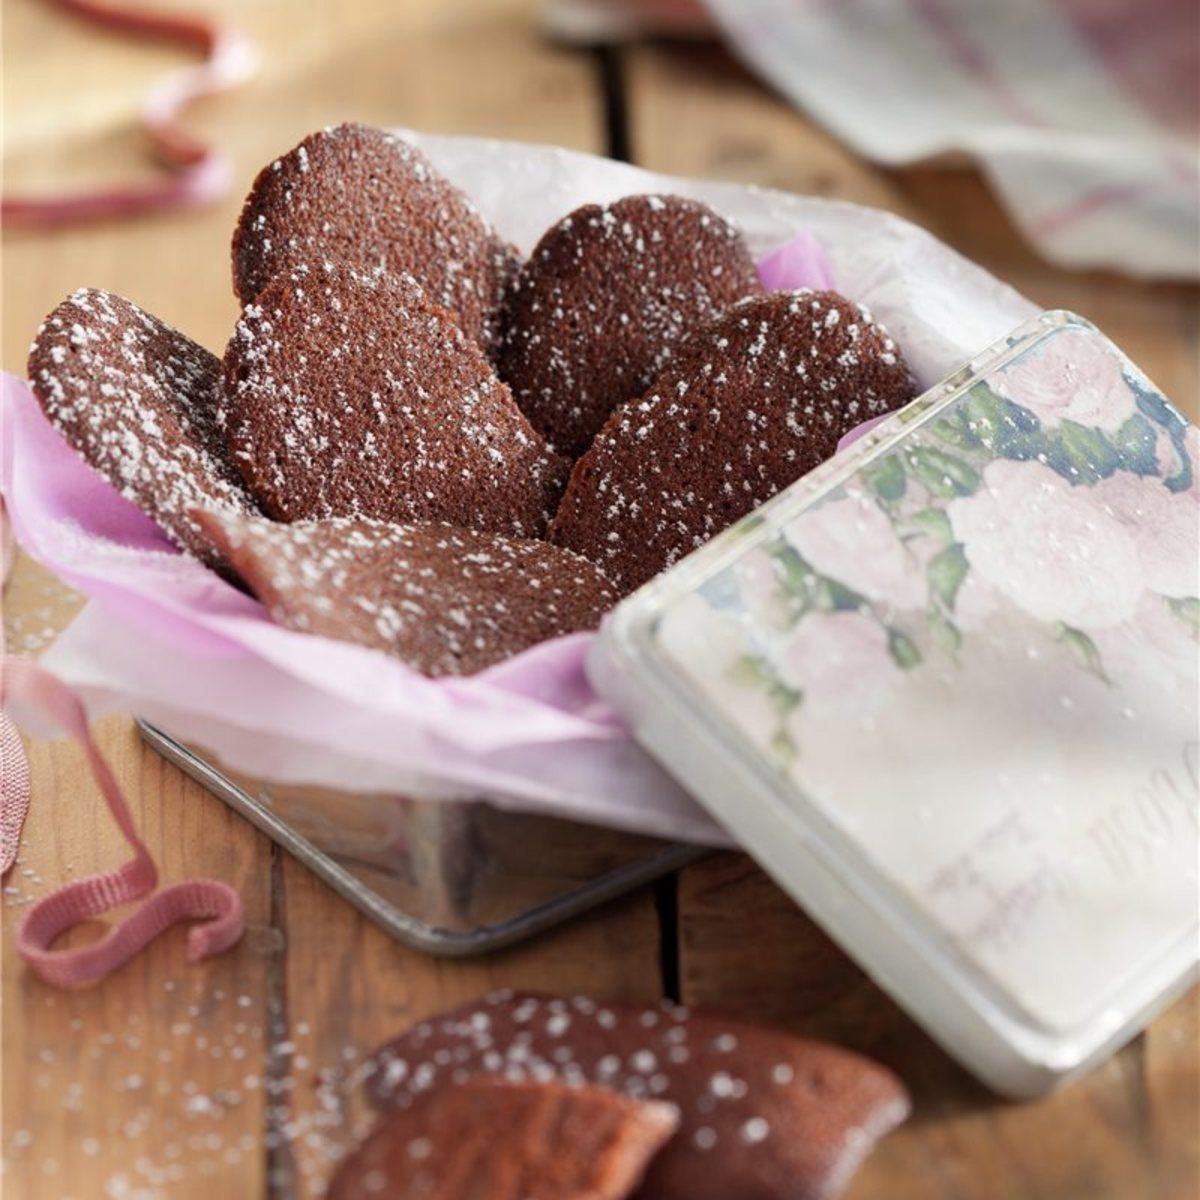 Spanish-style chocolate cookies